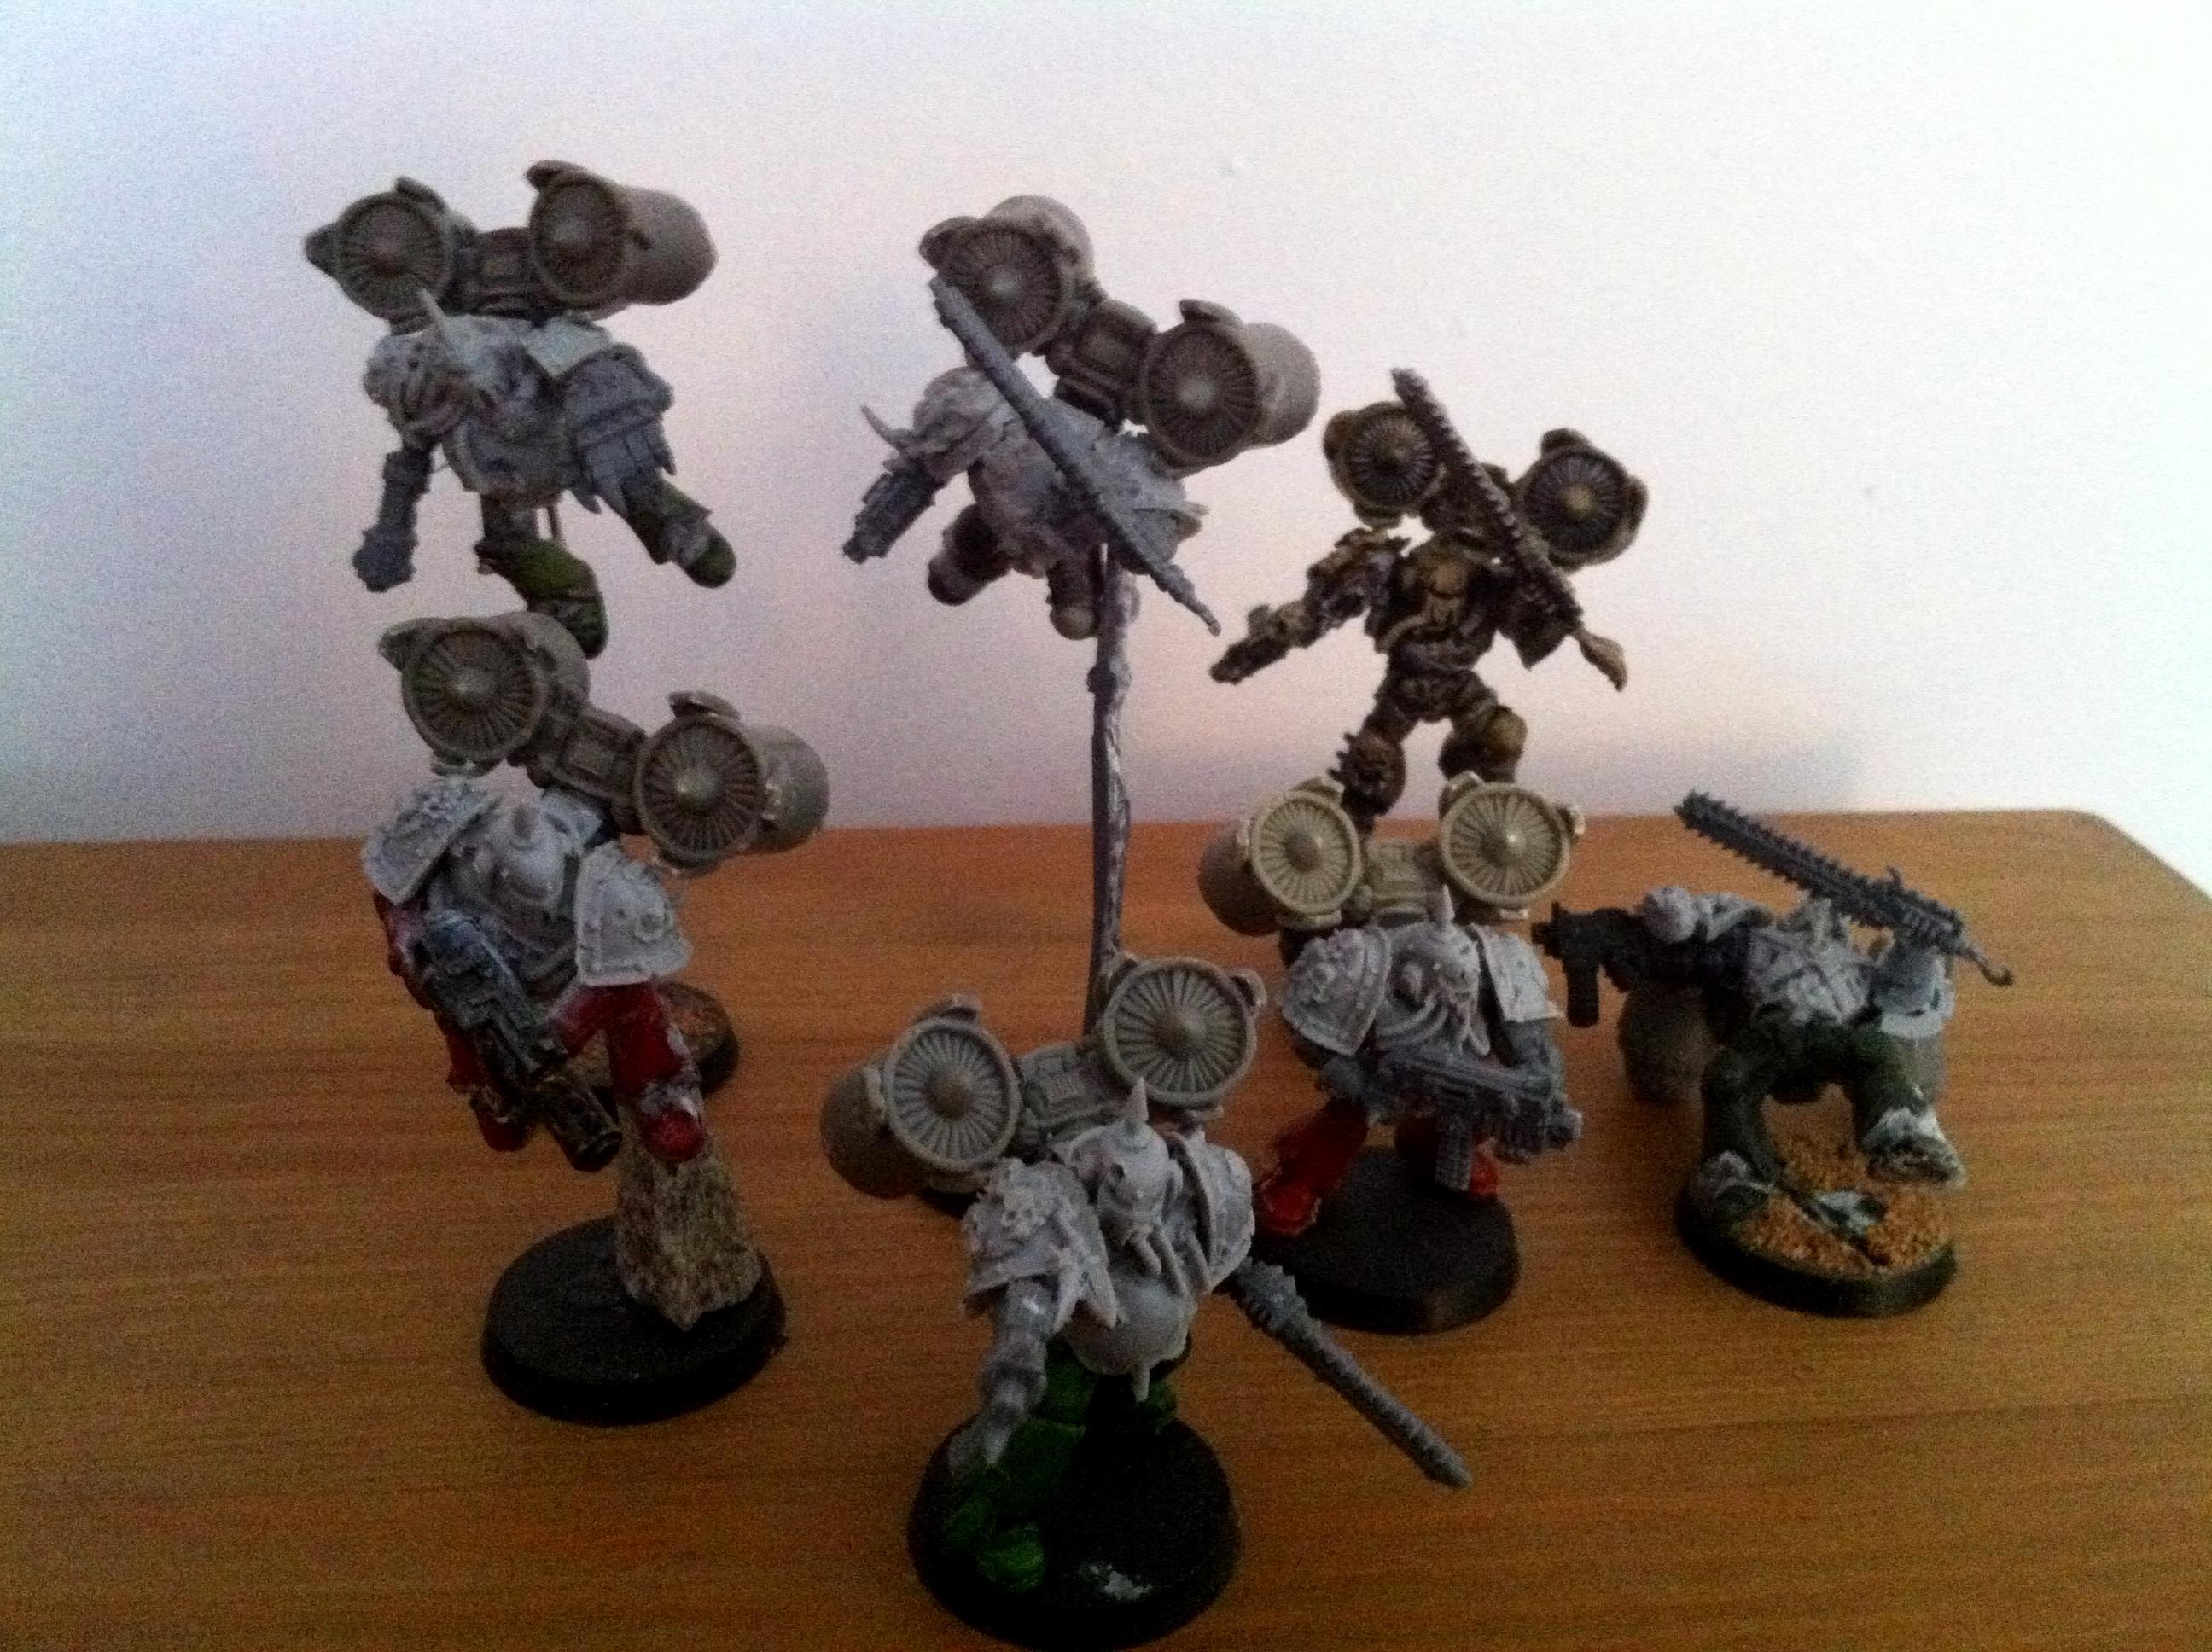 Death Guard, Forge World, Mortarion, Nurgle, Plague